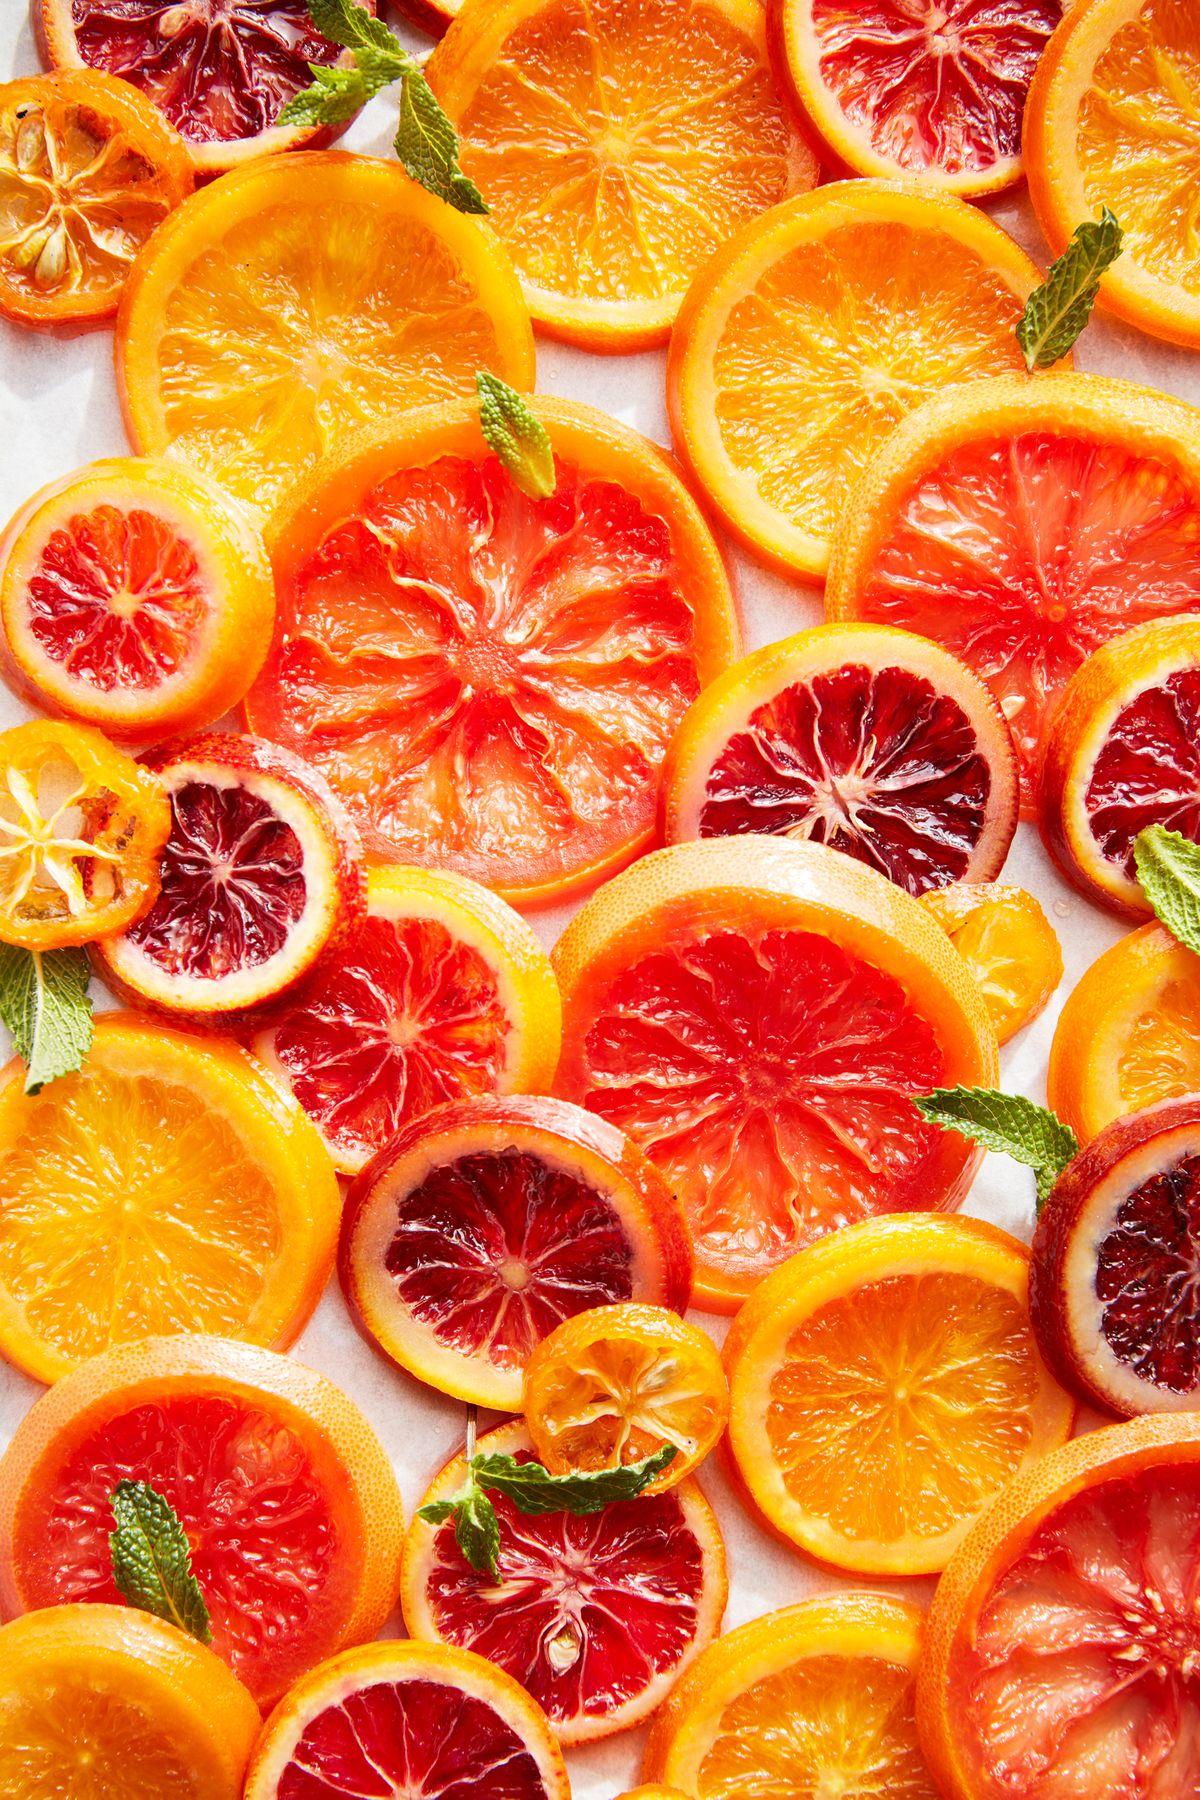 lisa bishop food stylist- candied grapefruit, blood oranges and oranges